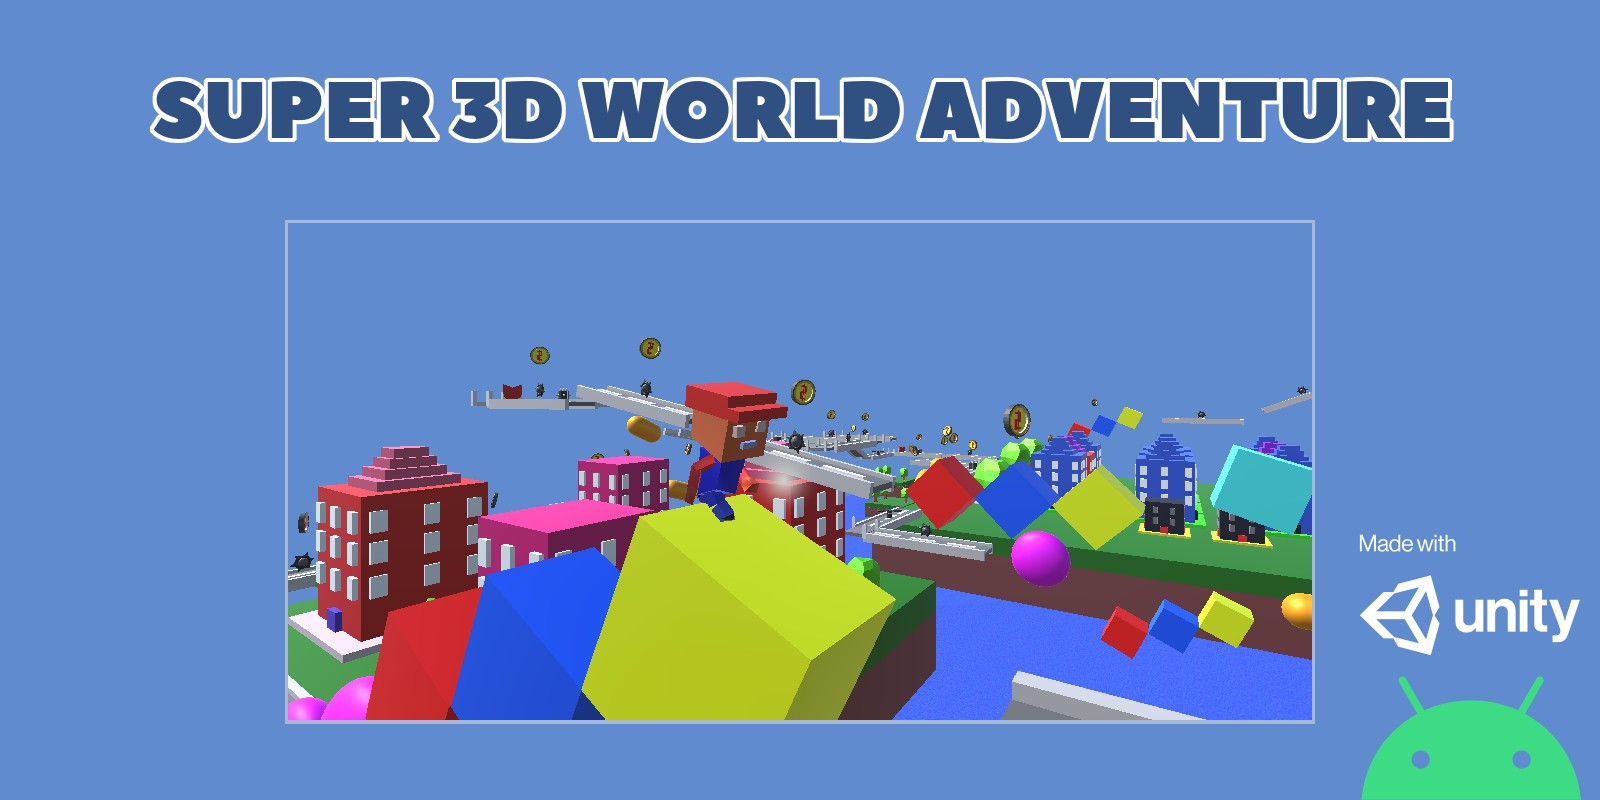 Super 3D World Adventure - Unity